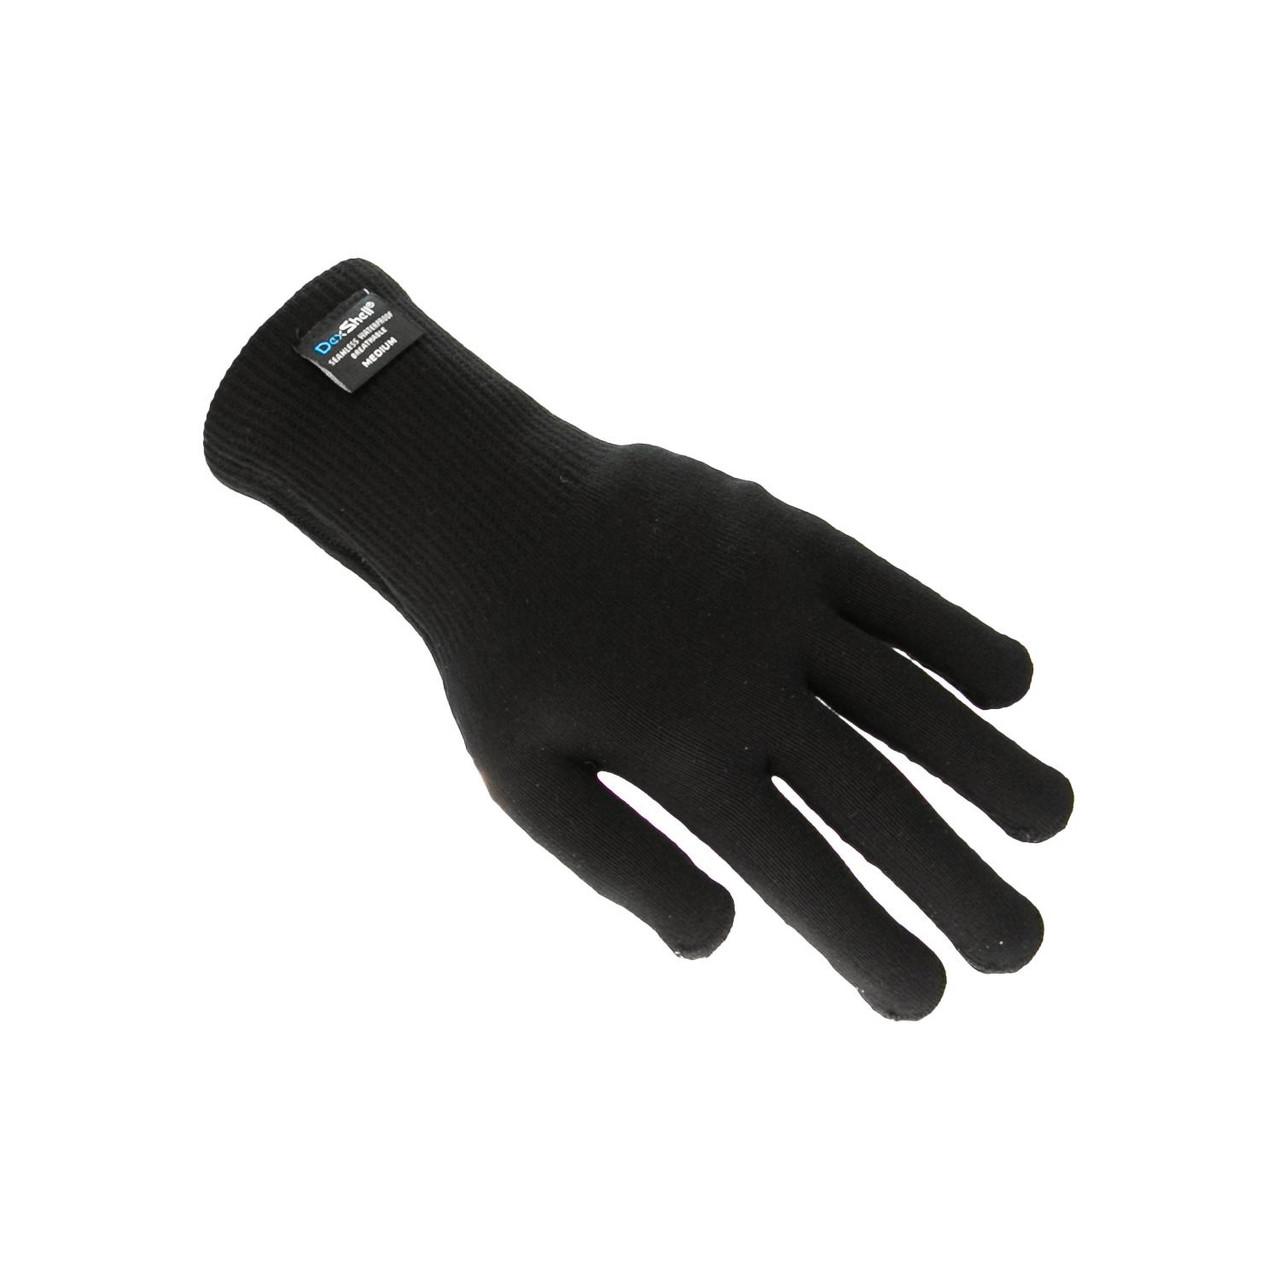 Dexshell Thermfit Waterproof Gloves (Large)